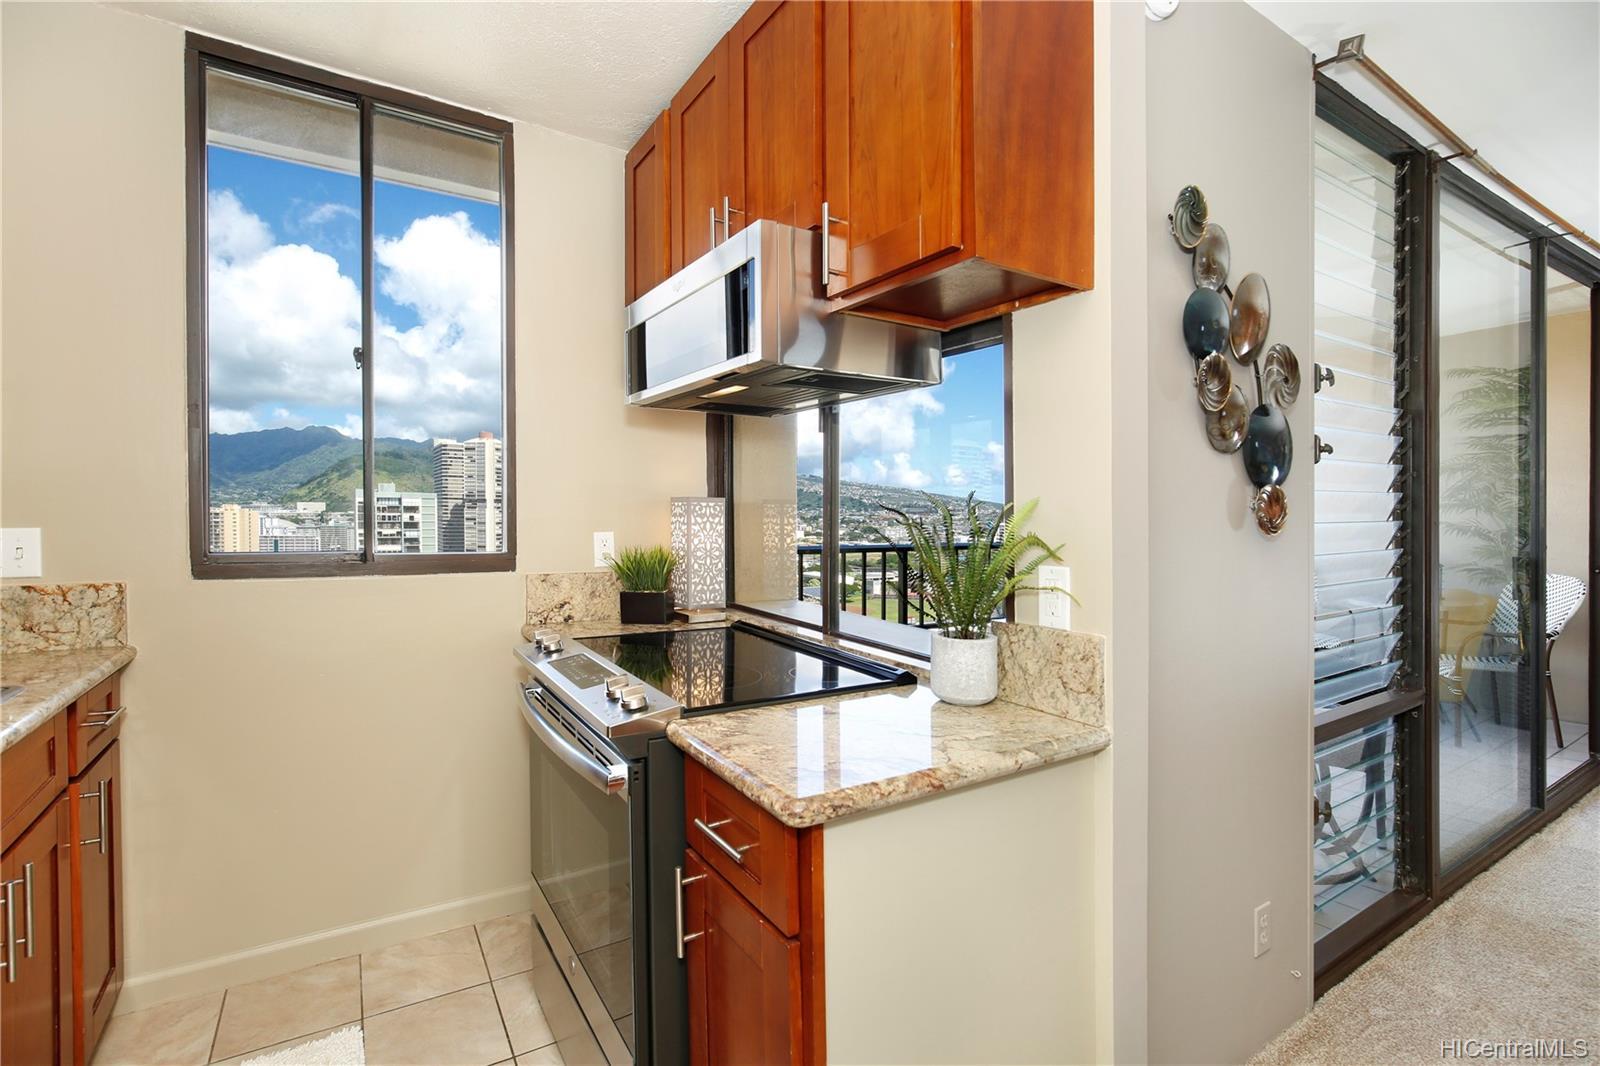 2121 Ala Wai Blvd Honolulu - Rental - photo 4 of 16